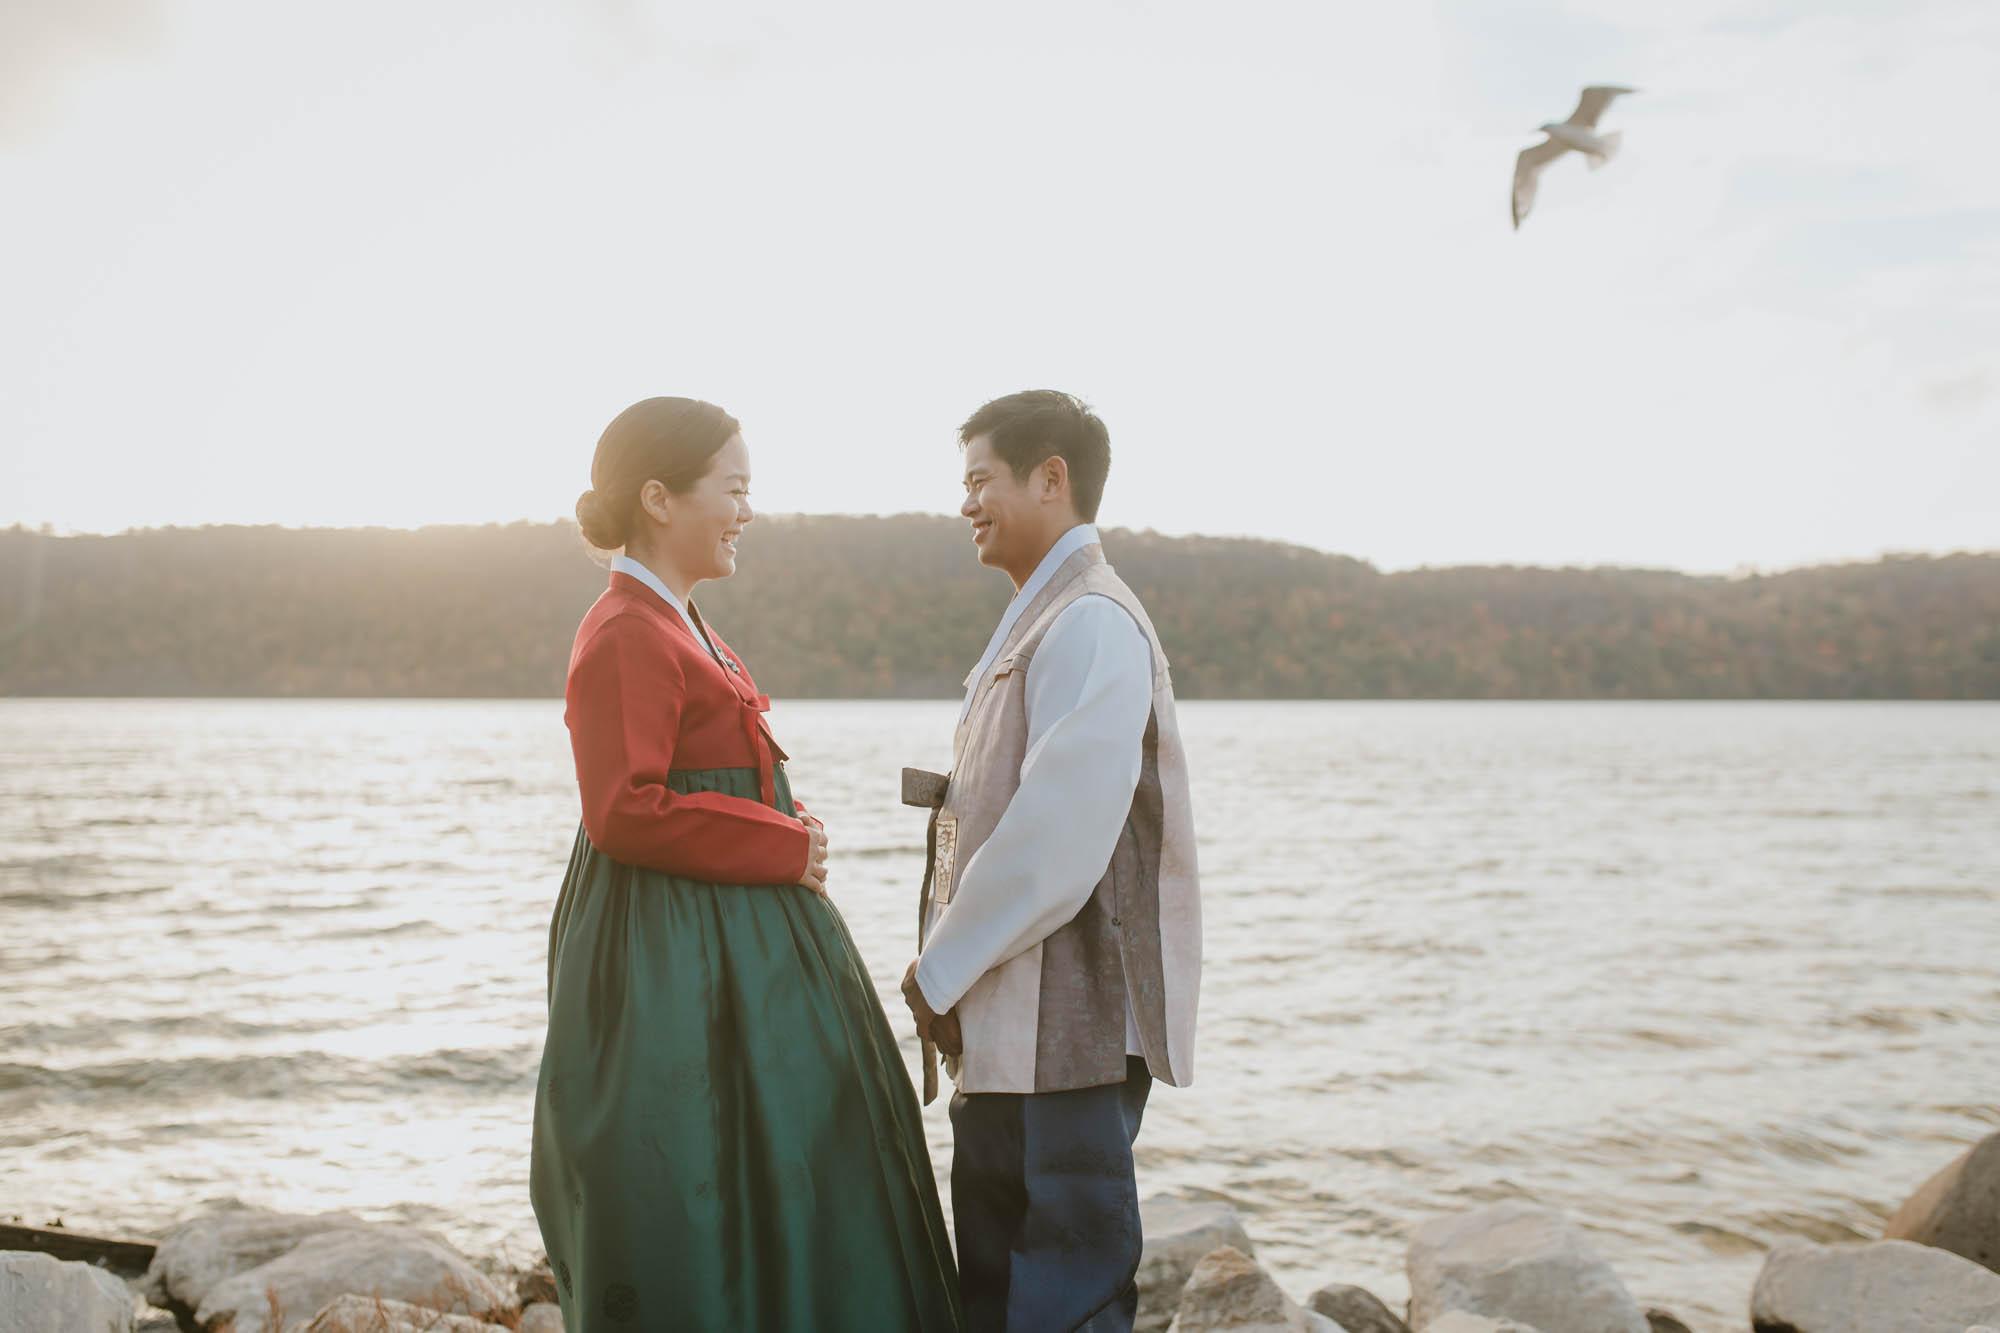 hastings-on-hudson-wedding-photographer-18.jpg